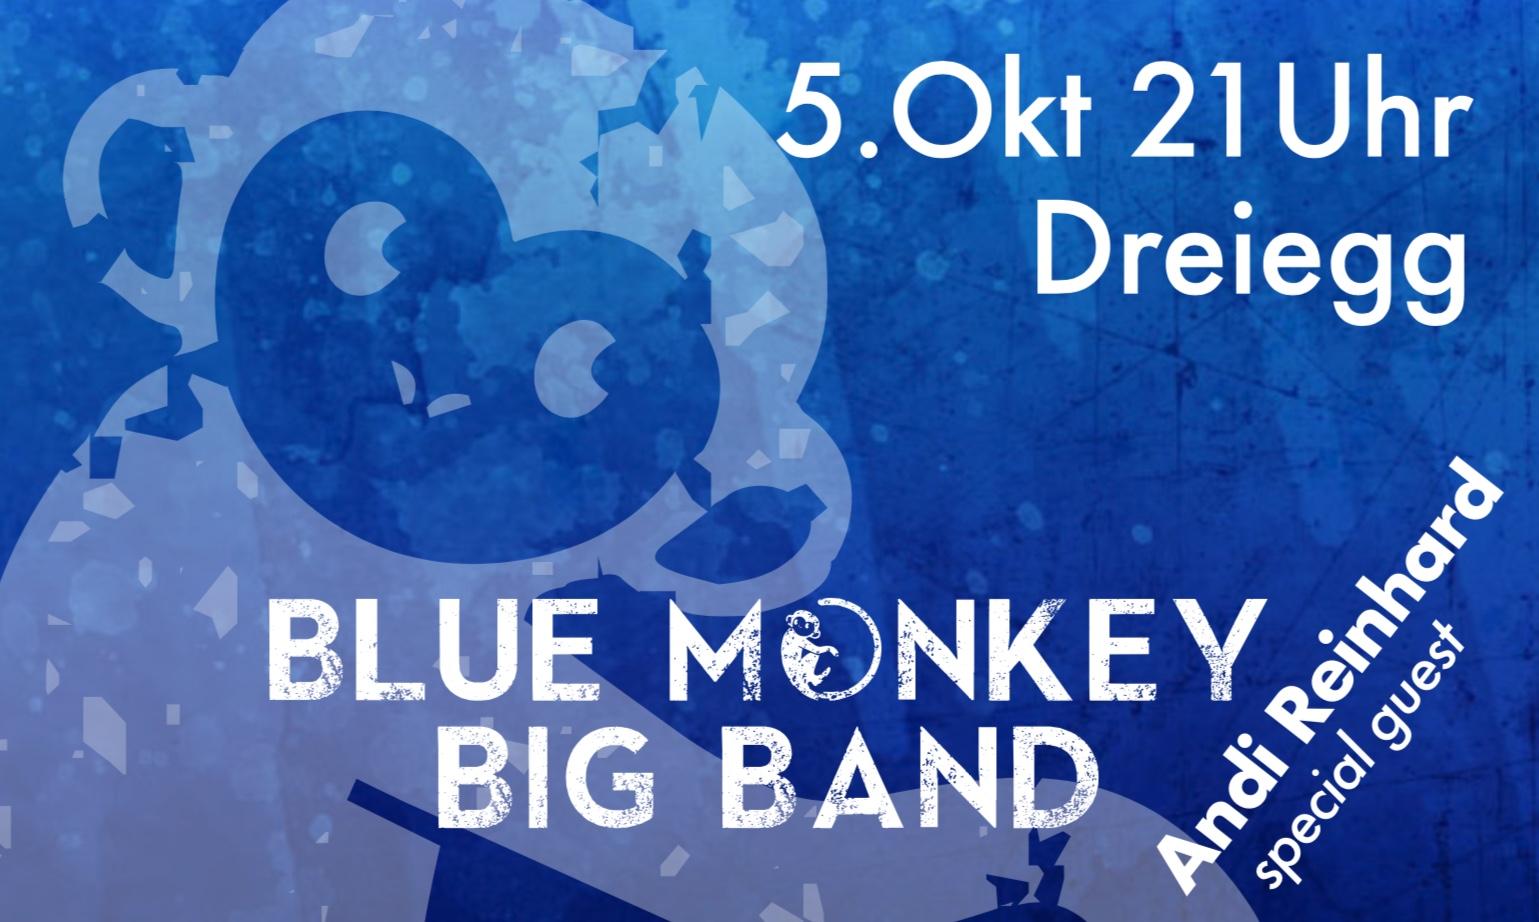 Flyer BlueMonkey 2019-10-05 Dreiegg